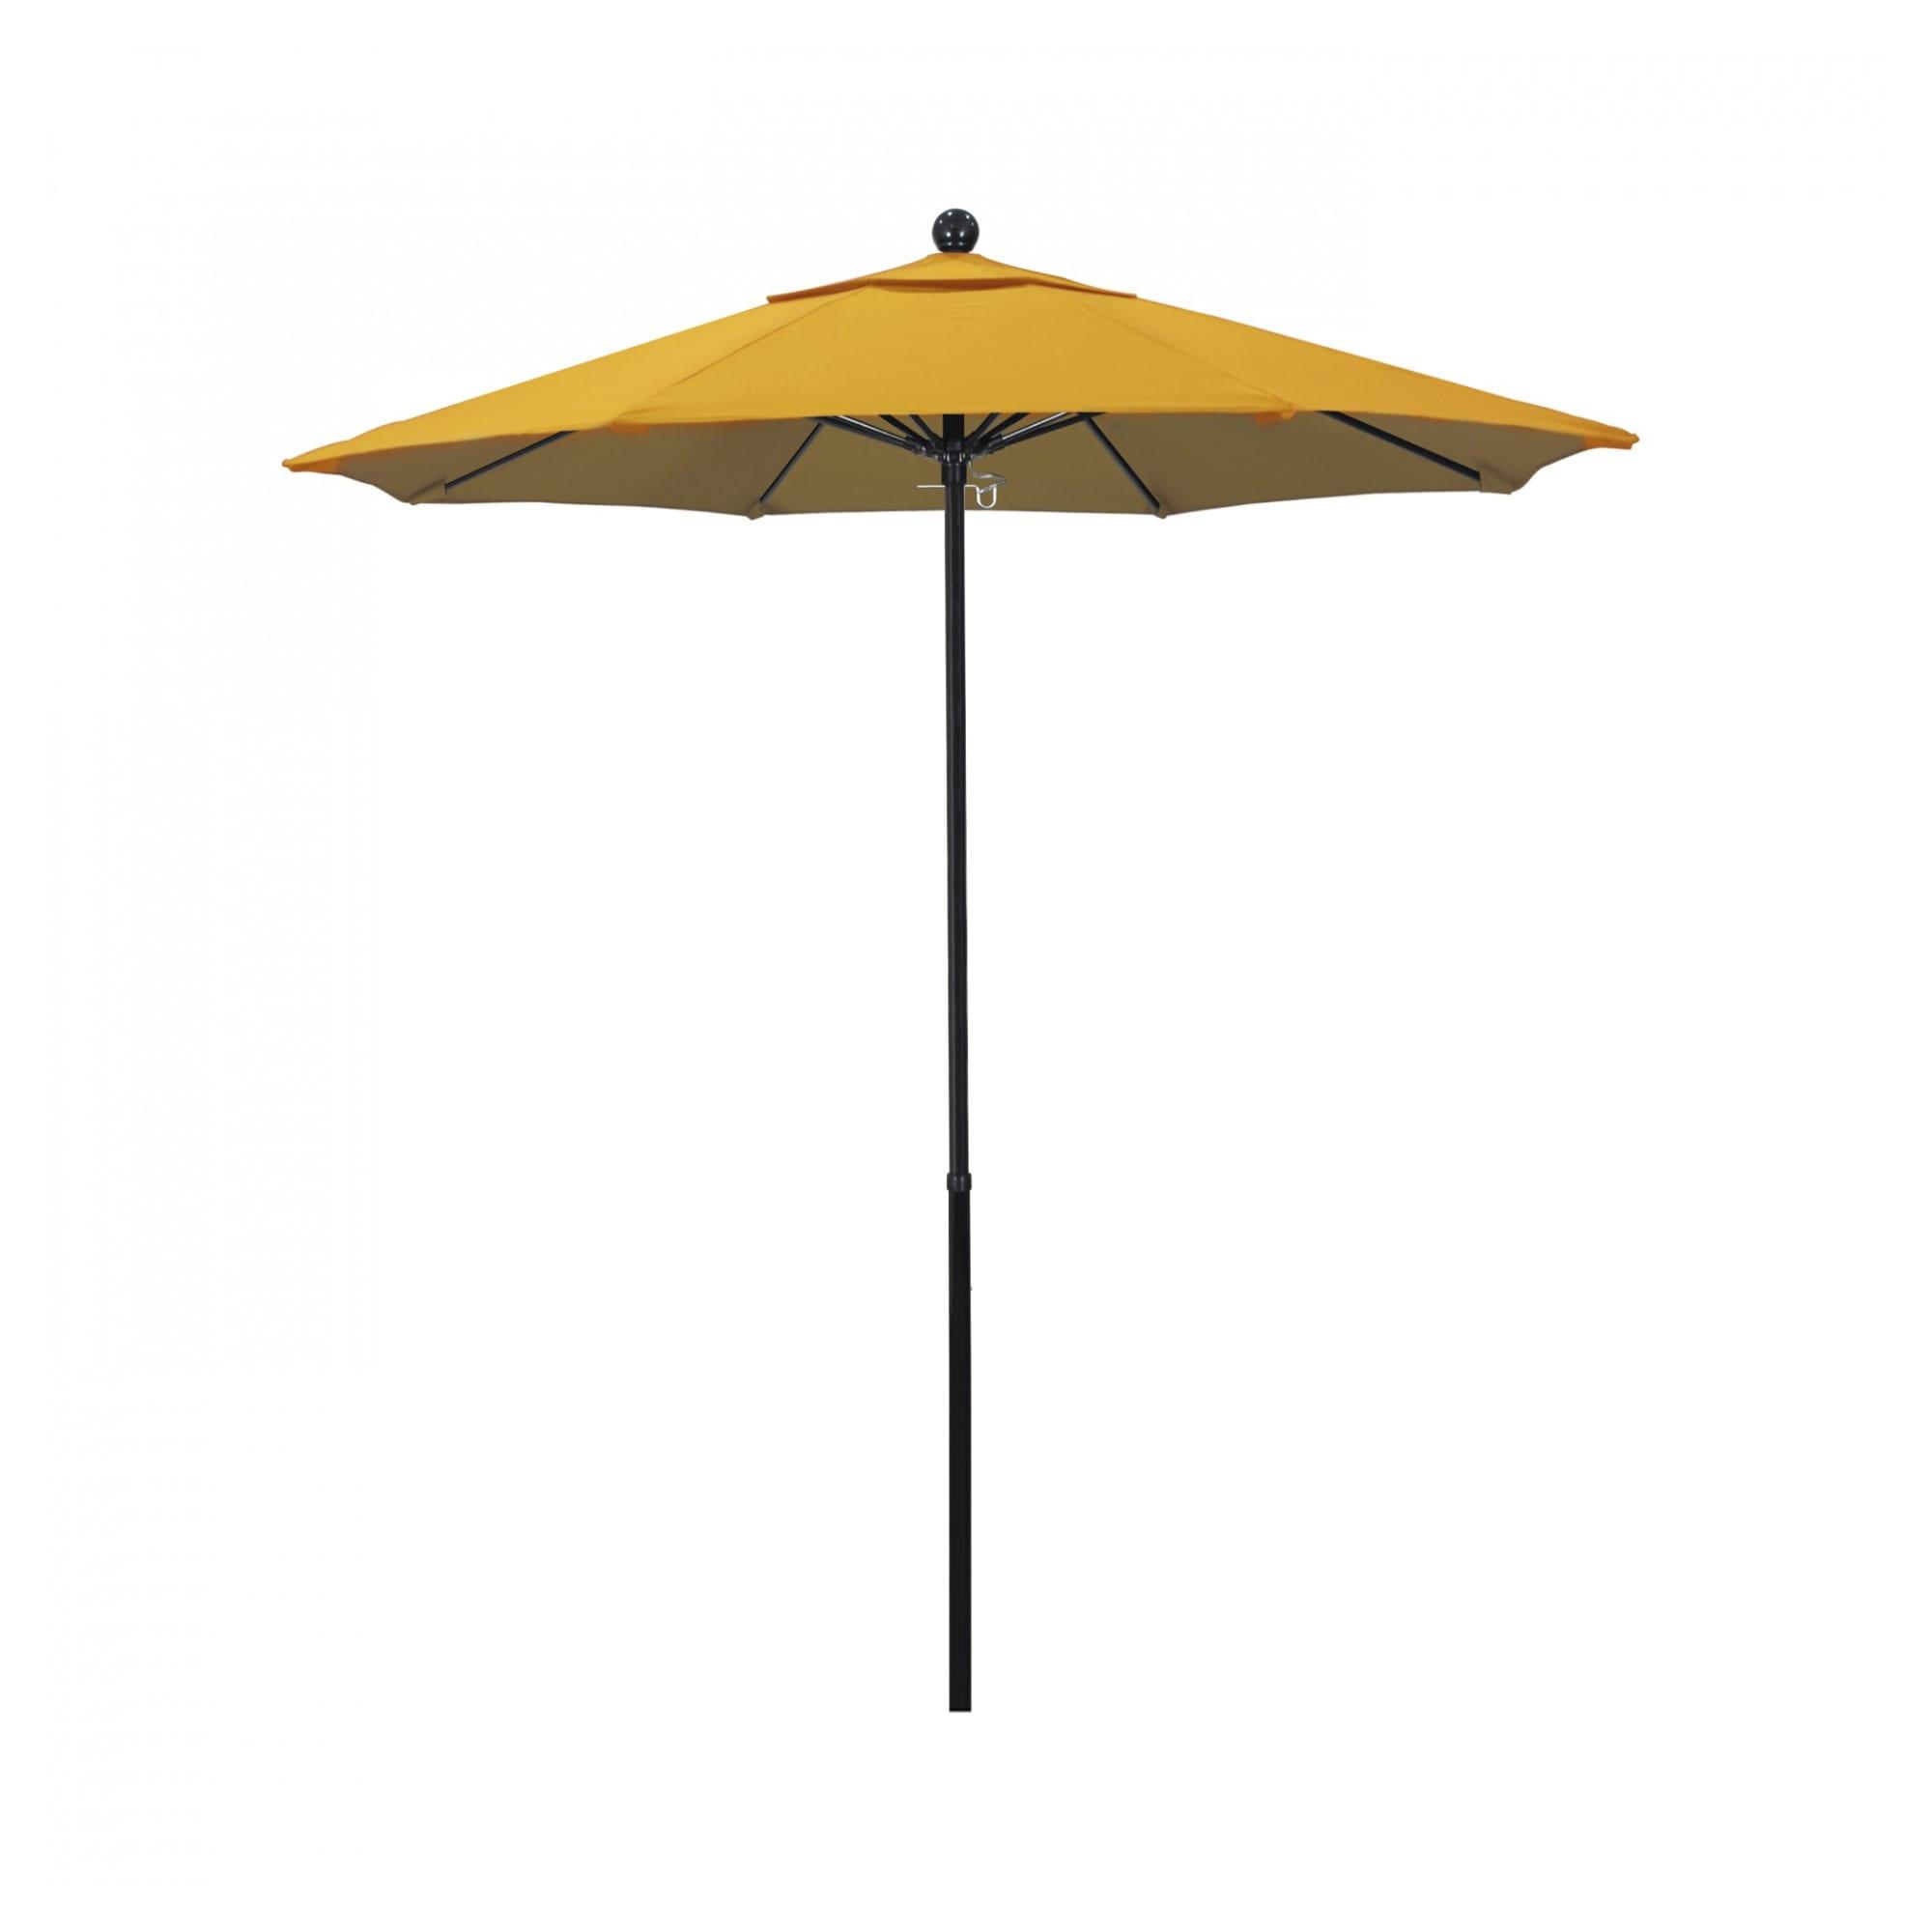 7.5 ft Frisco Fiberglass Commercial Umbrella with 7.5 ft Frisco Fiberglass Commercial Umbrella